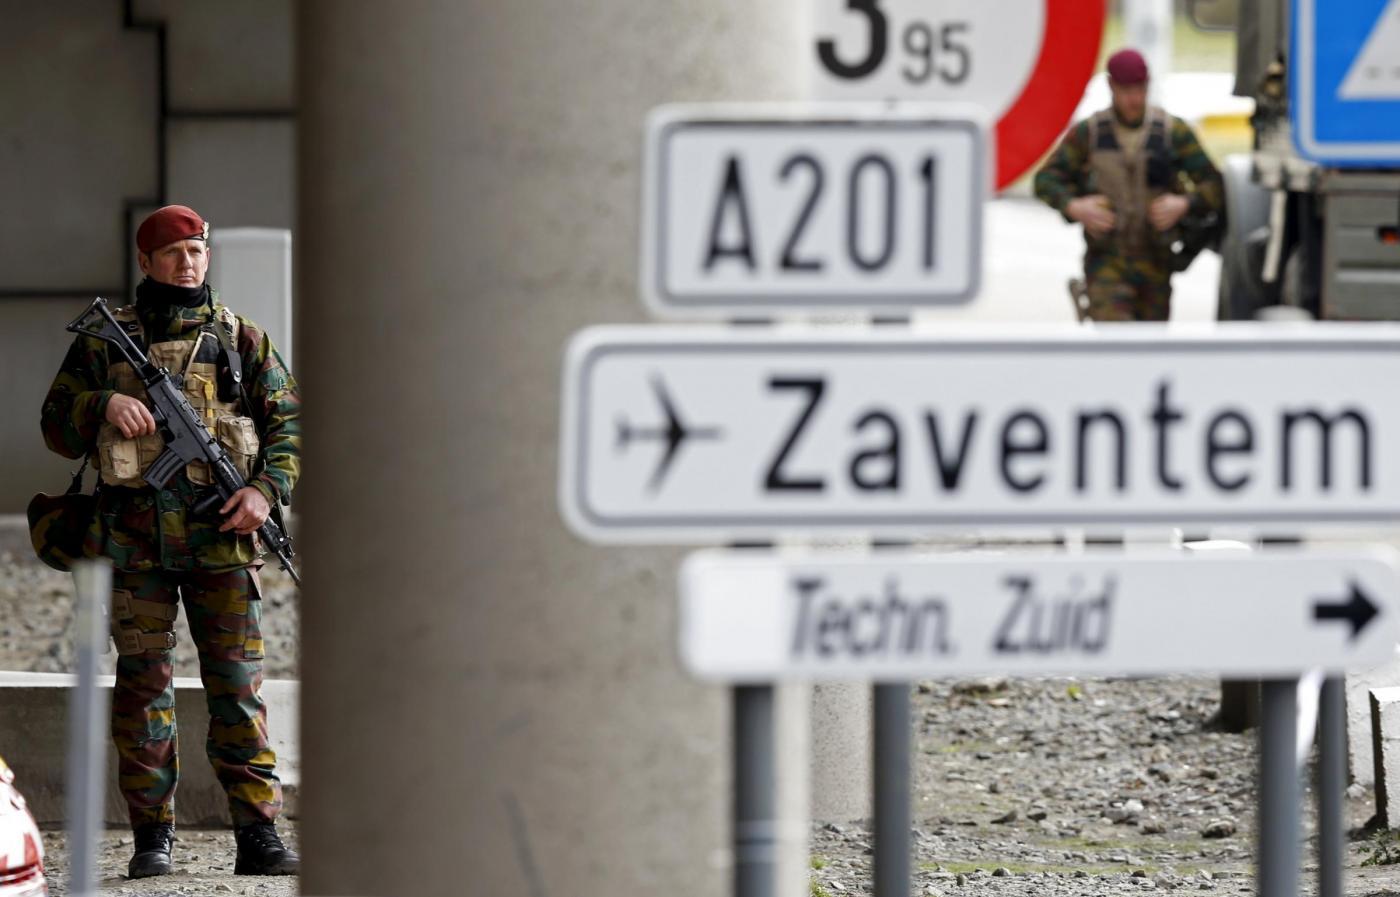 Belgio, controlli di sicurezza a Bruxelles